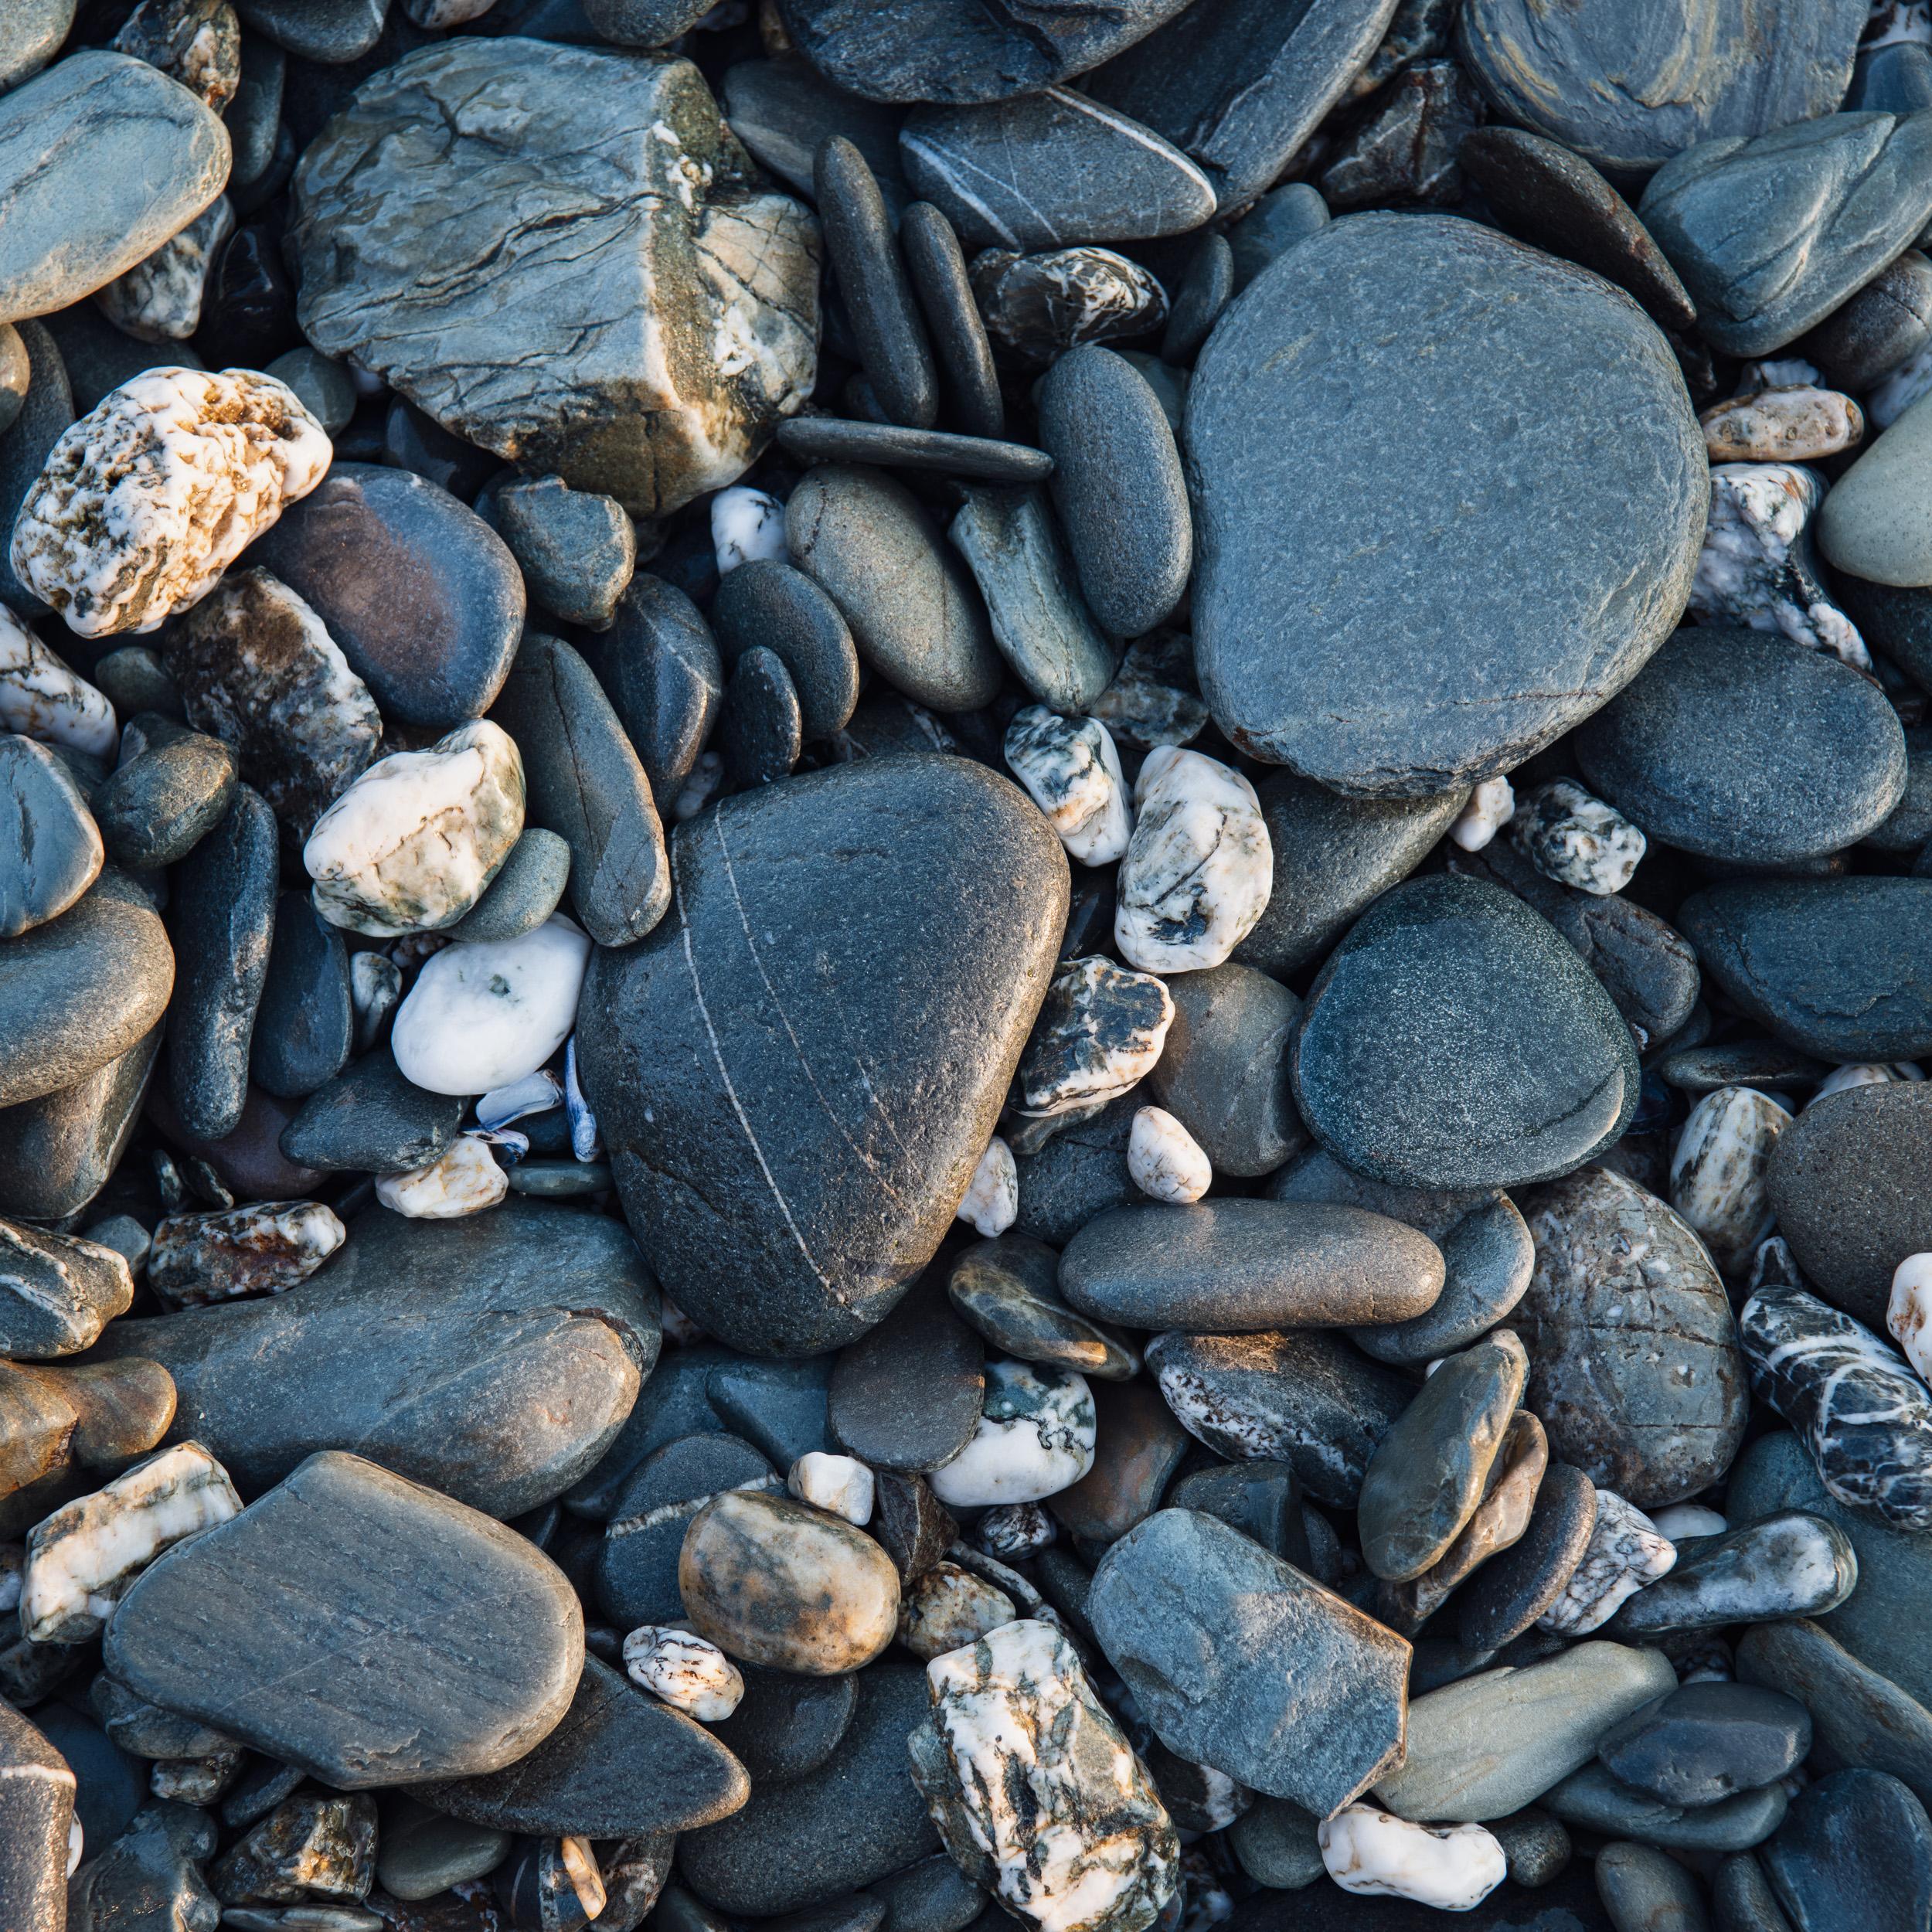 Godrevy Point Beach Stones (Godrevy Cove), Cornwall  - Nikon D850, Nikkor 24-70 mm f/2.8 VR at 70 mm, f/8, 1/4th sec @ ISO 64, Lee Filters Landscape Polariser.